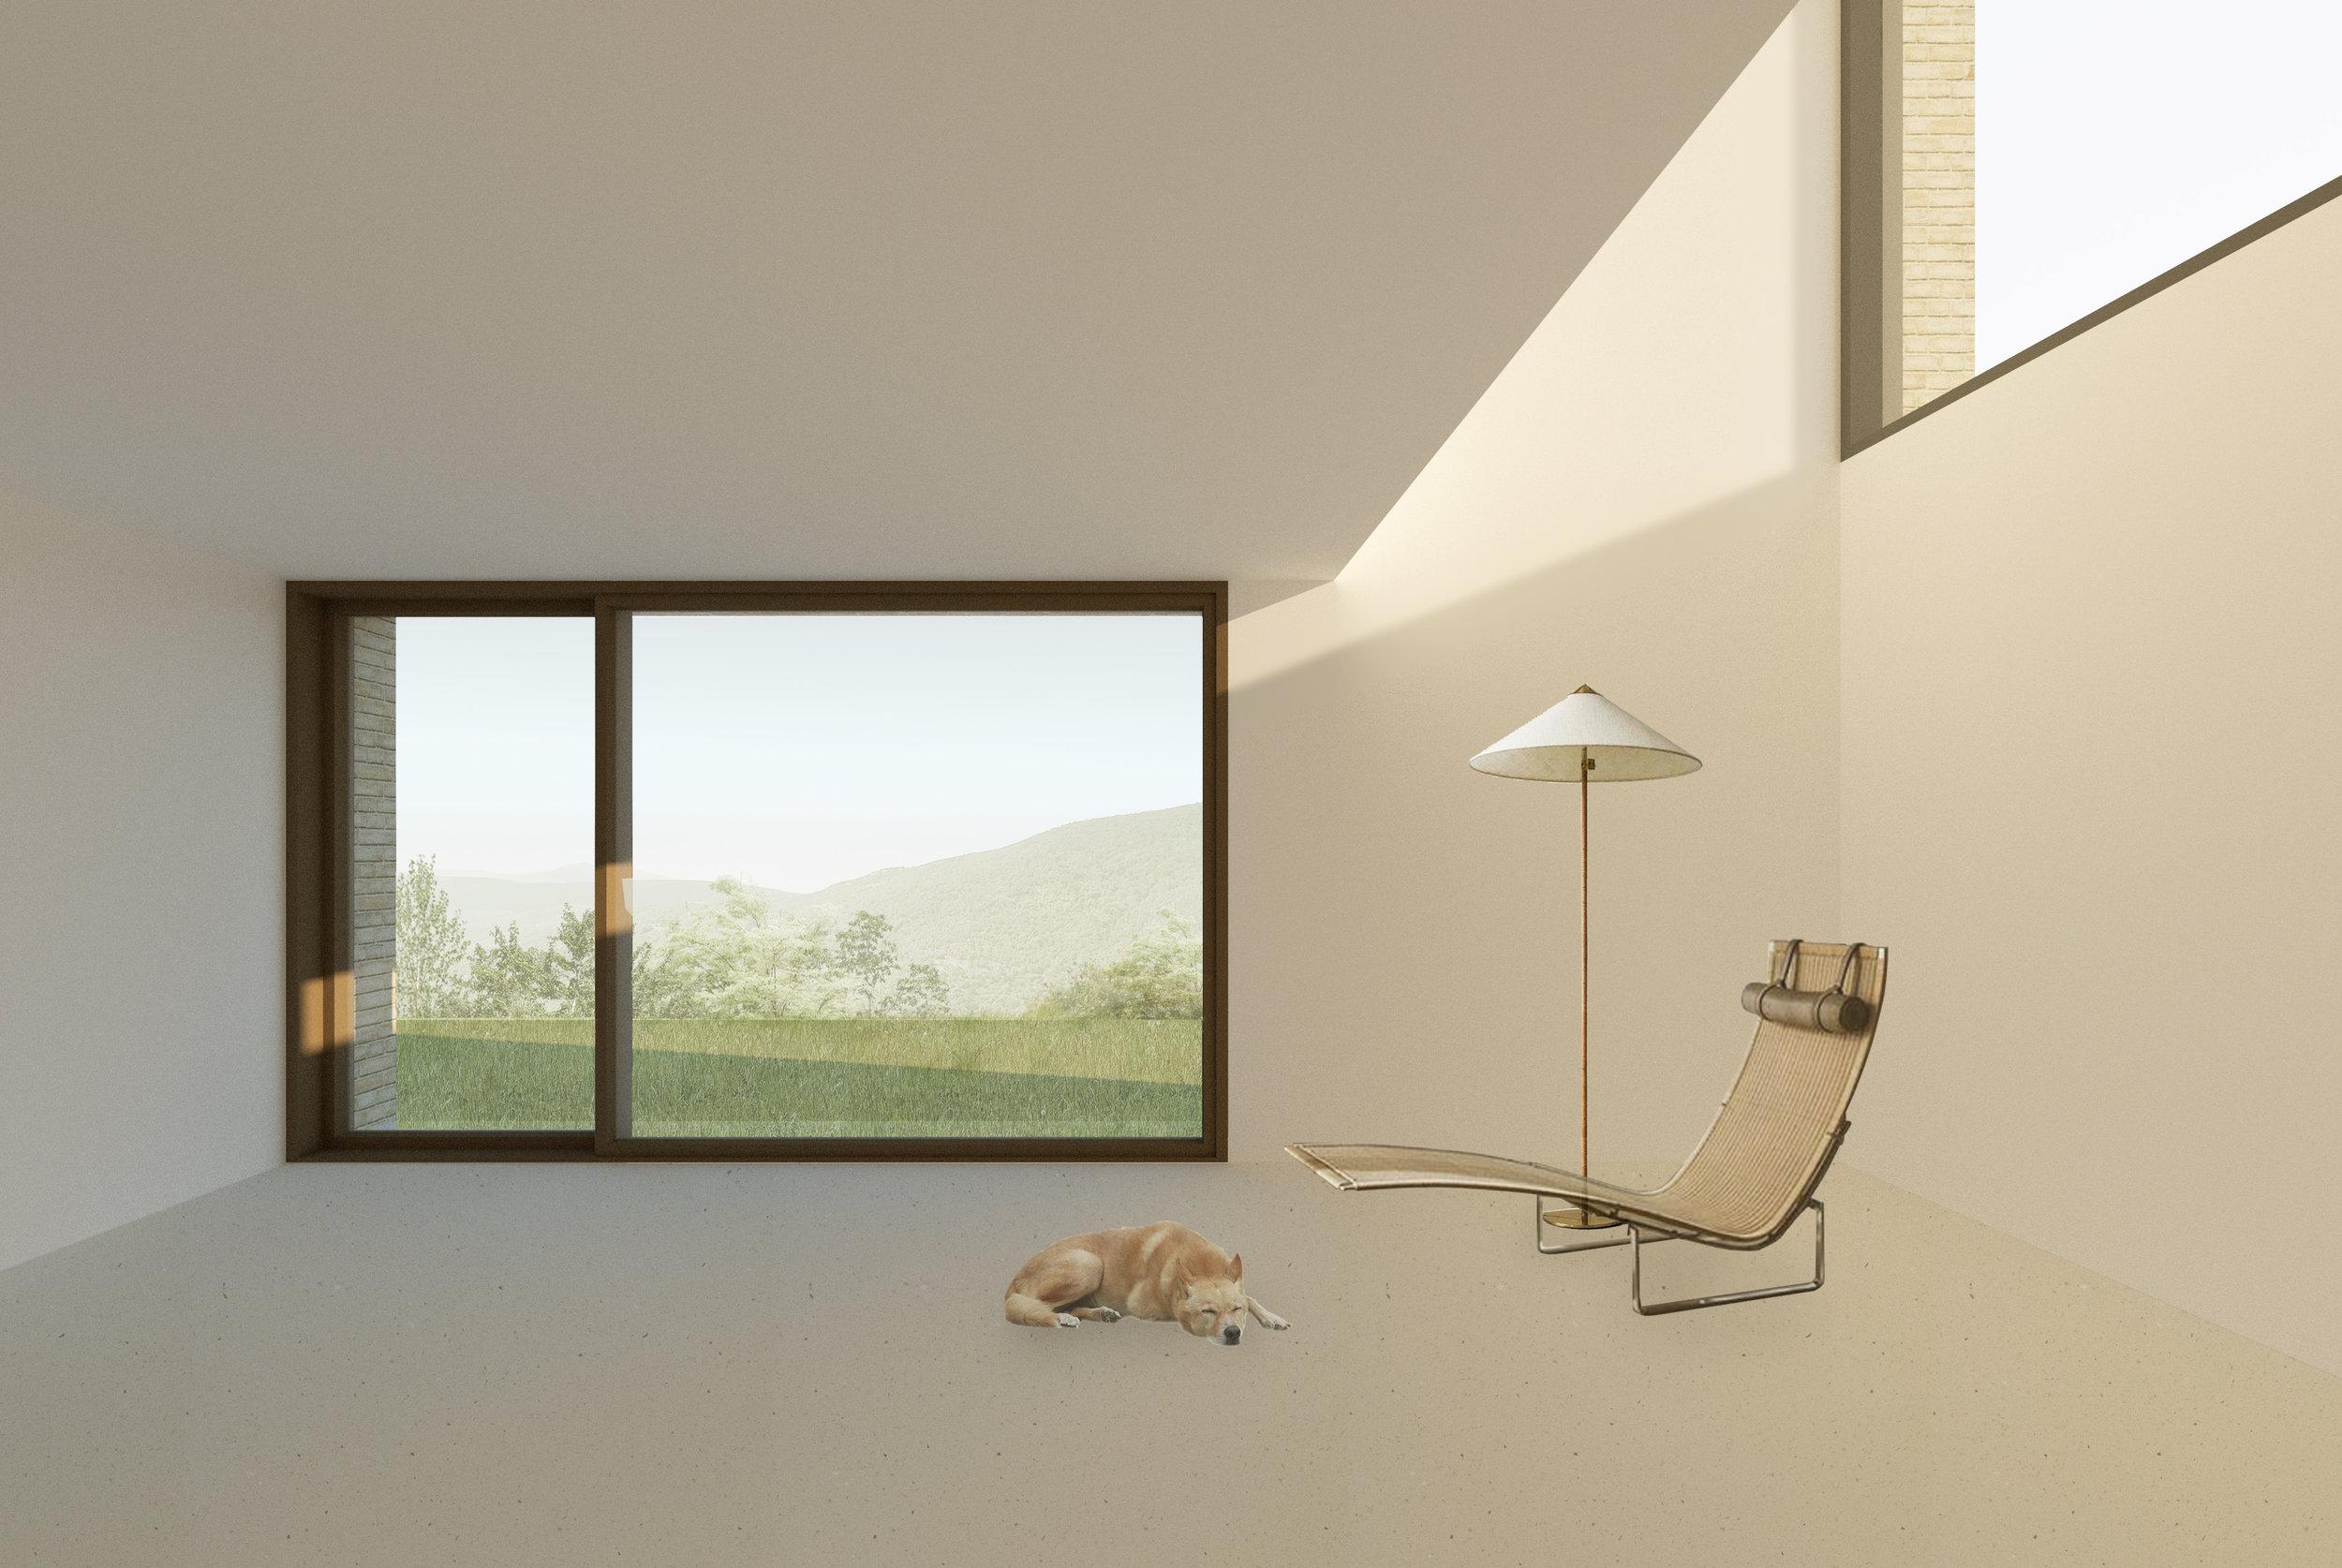 house_interior3.jpg